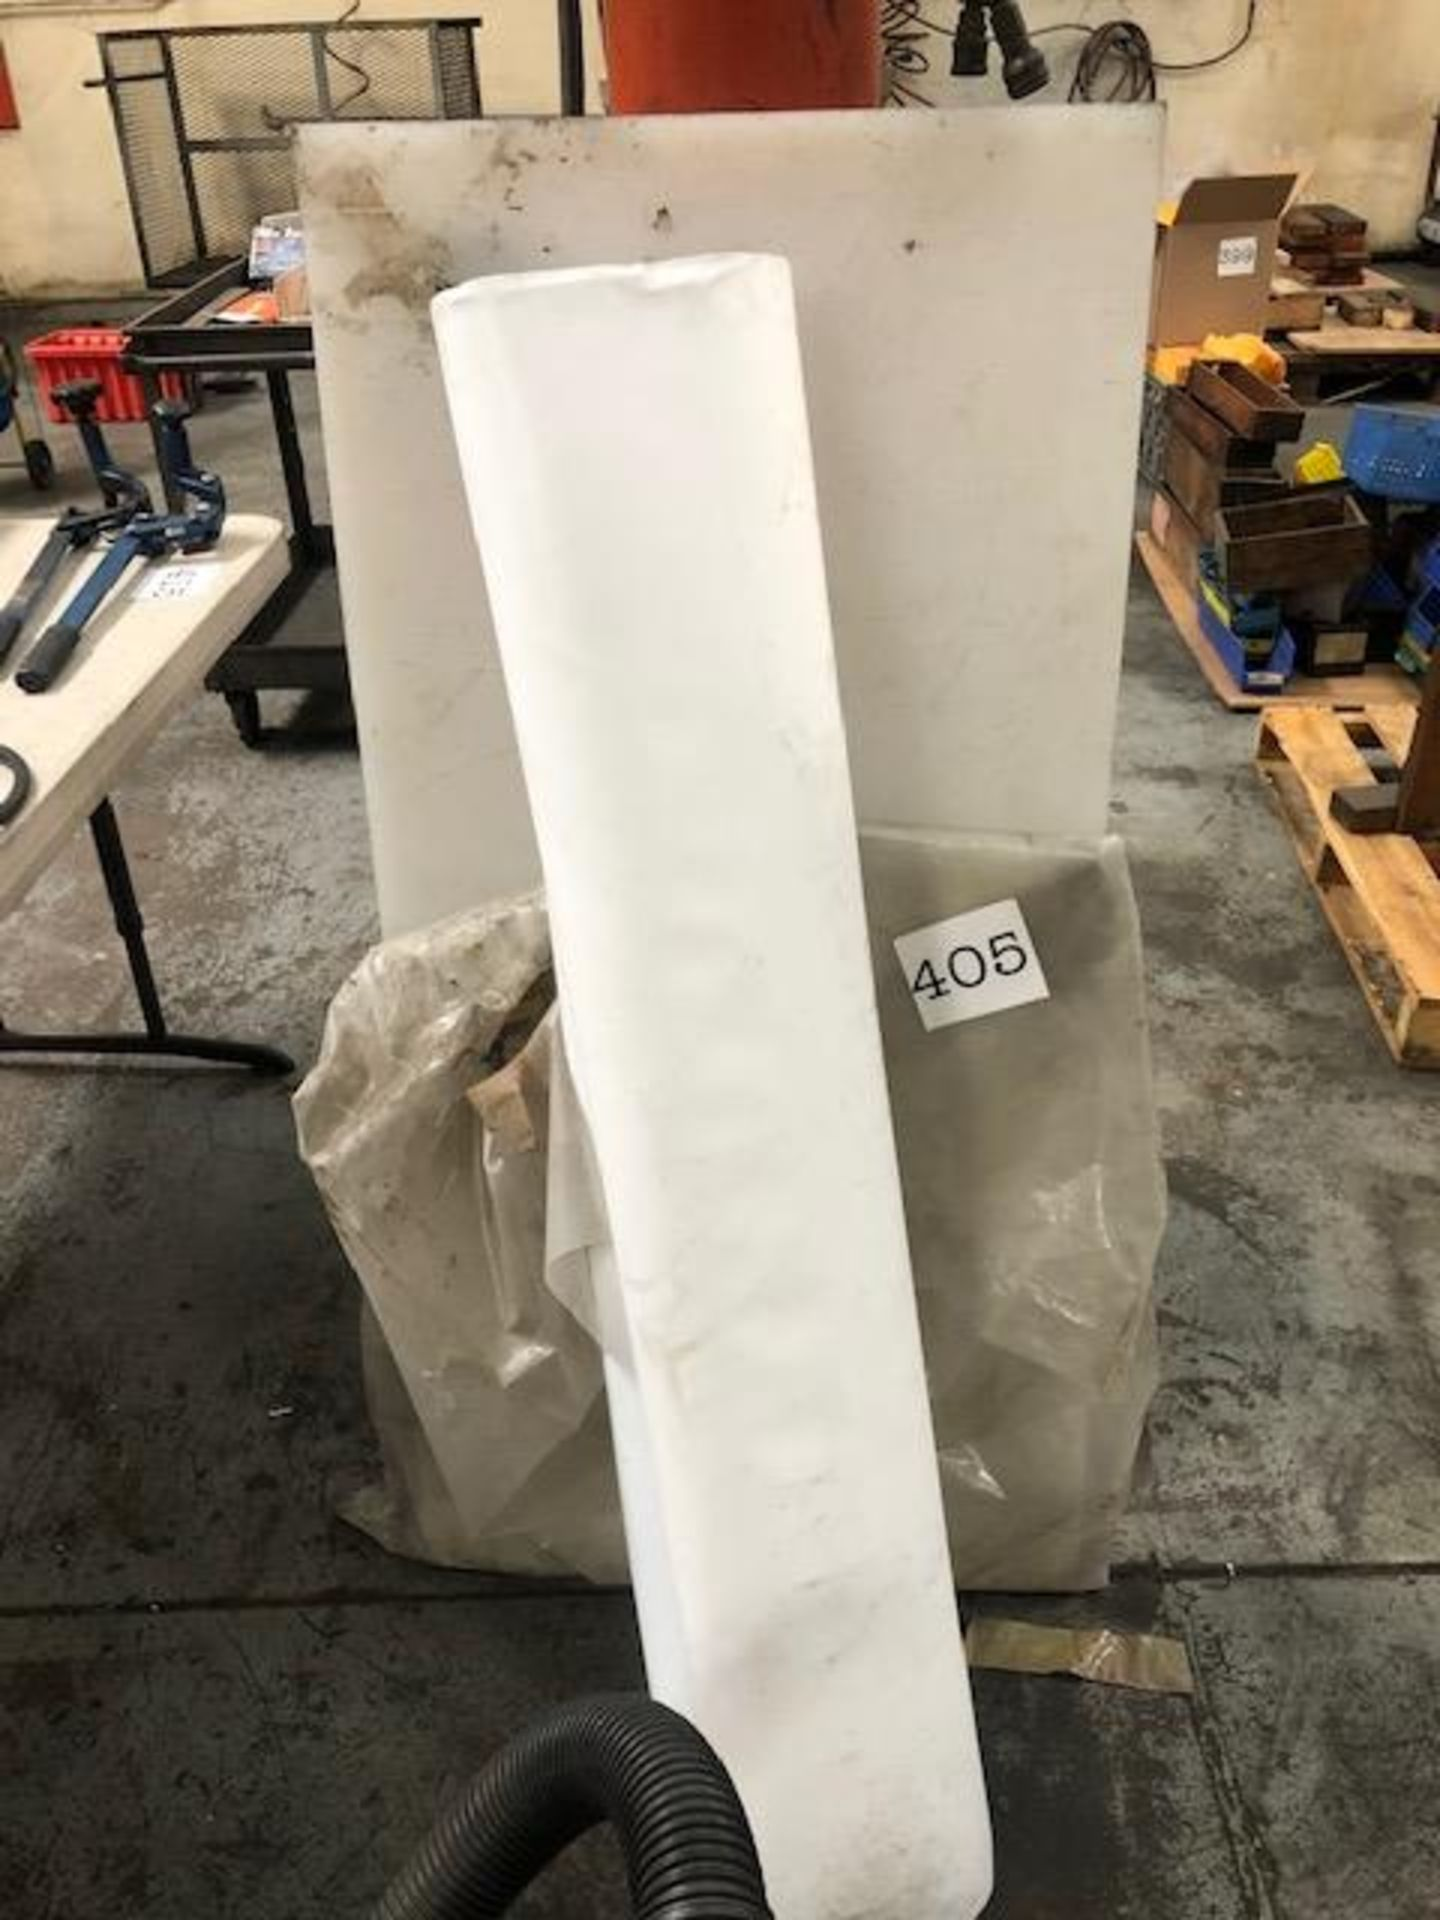 Lot 405 - Miscellaneous White Plastic Material